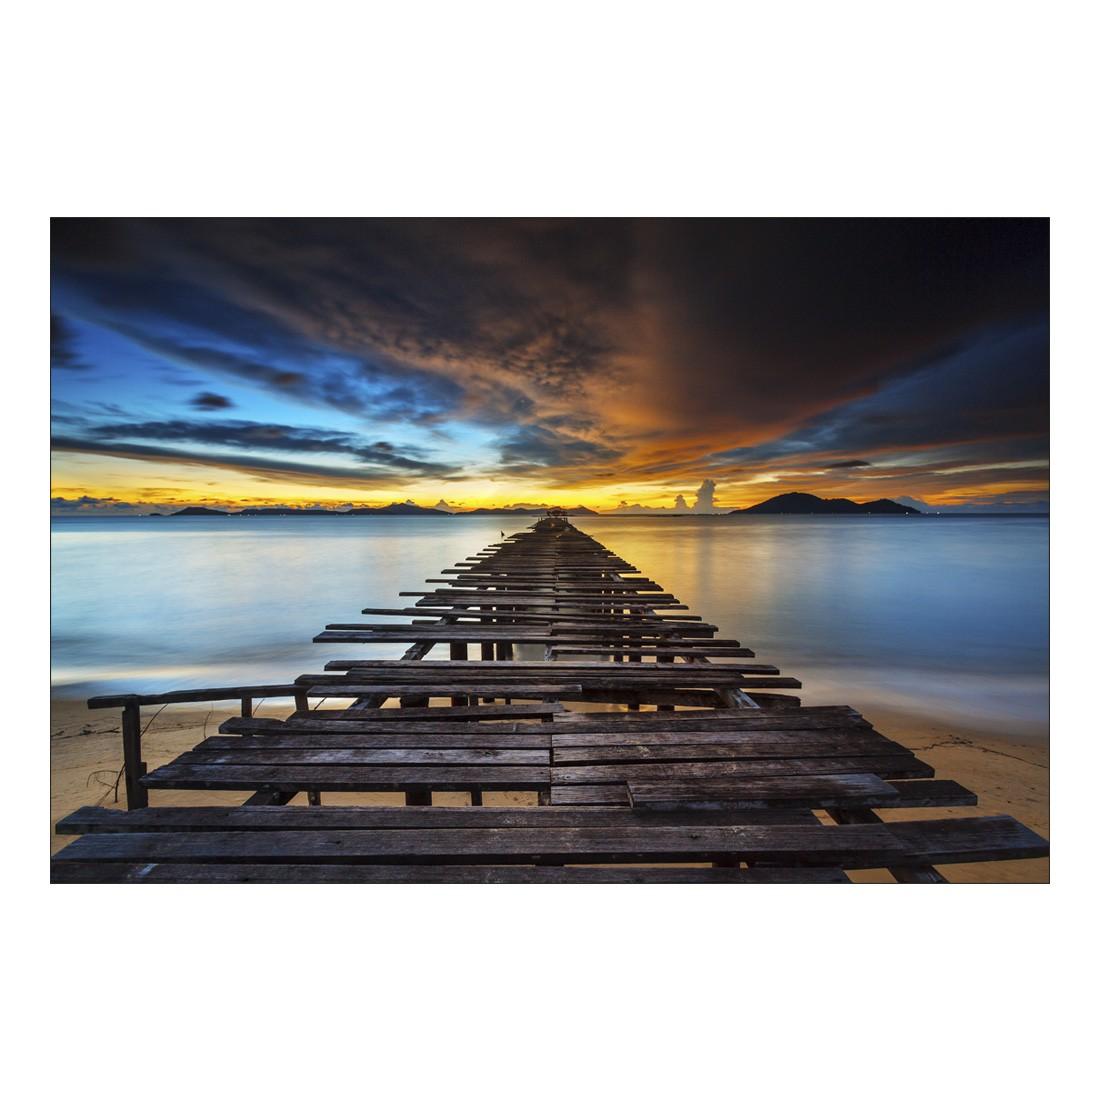 Acrylglasbild Mesmerizing Seascapes – Abmessung 90×60 cm, Gallery of Innovative Art günstig bestellen